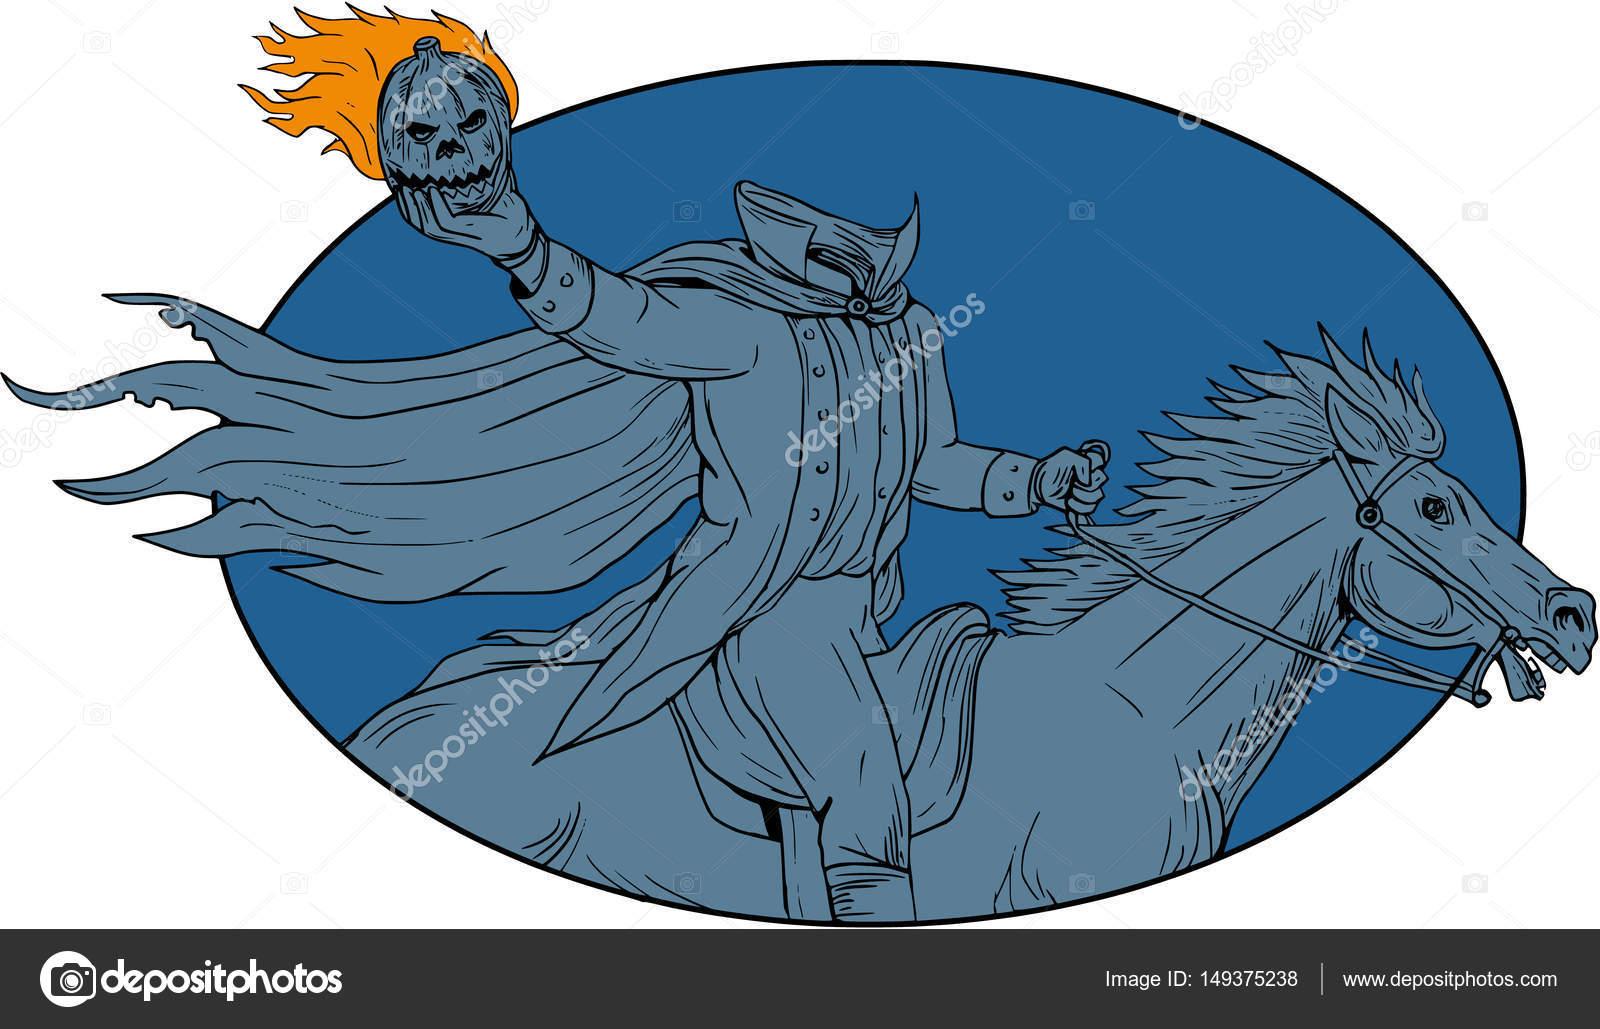 Jinete sin cabeza de calabaza caballo dibujo Oval — Archivo Imágenes ...